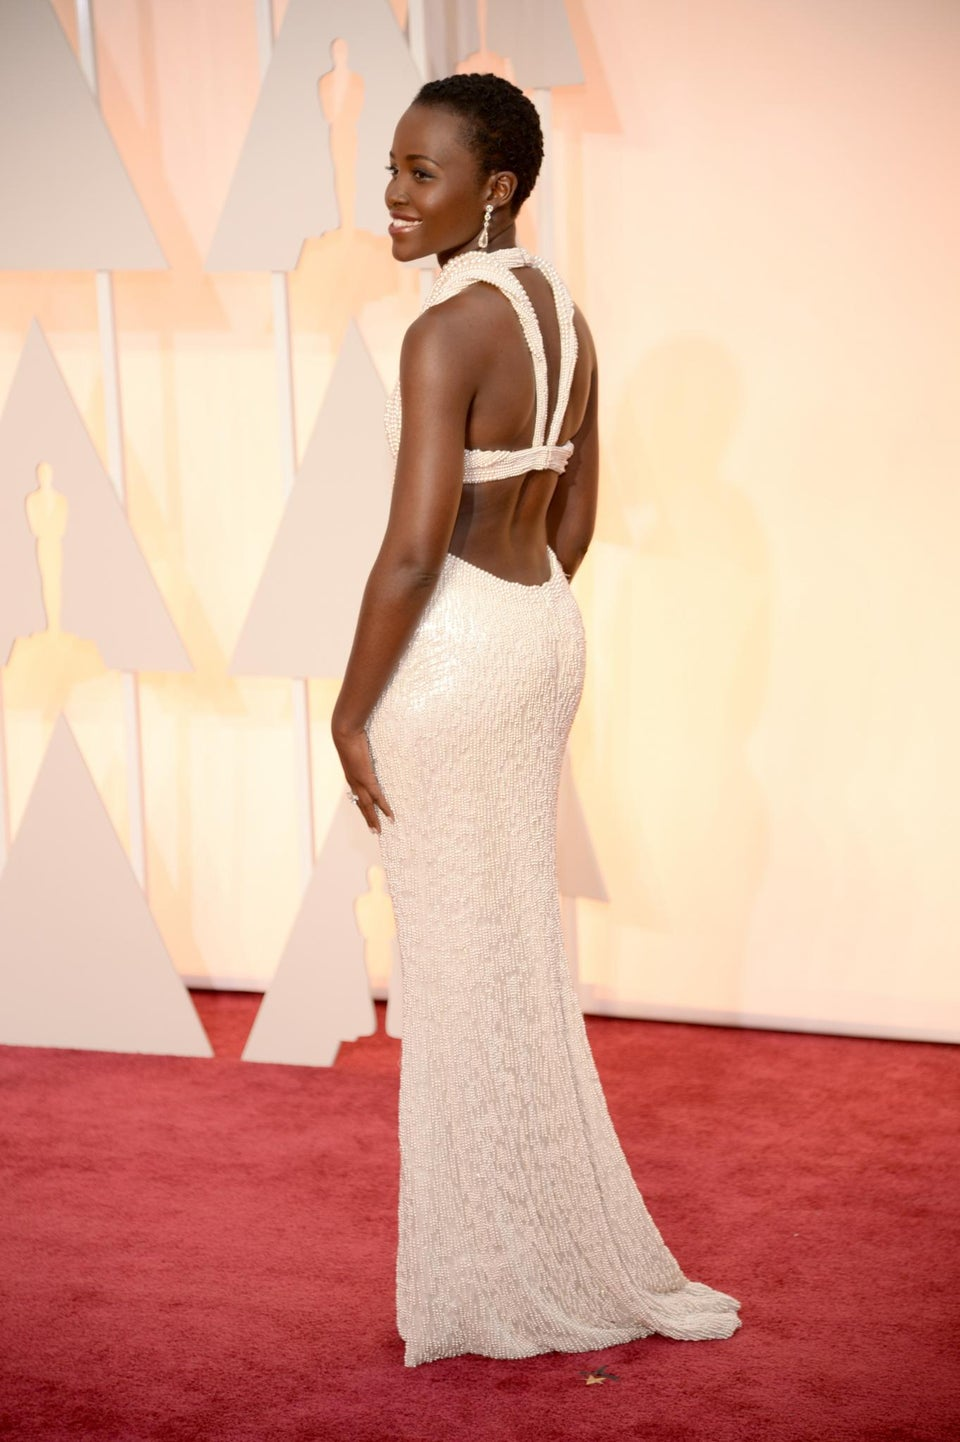 Lupita's Oscars Dress Returned to Hotel